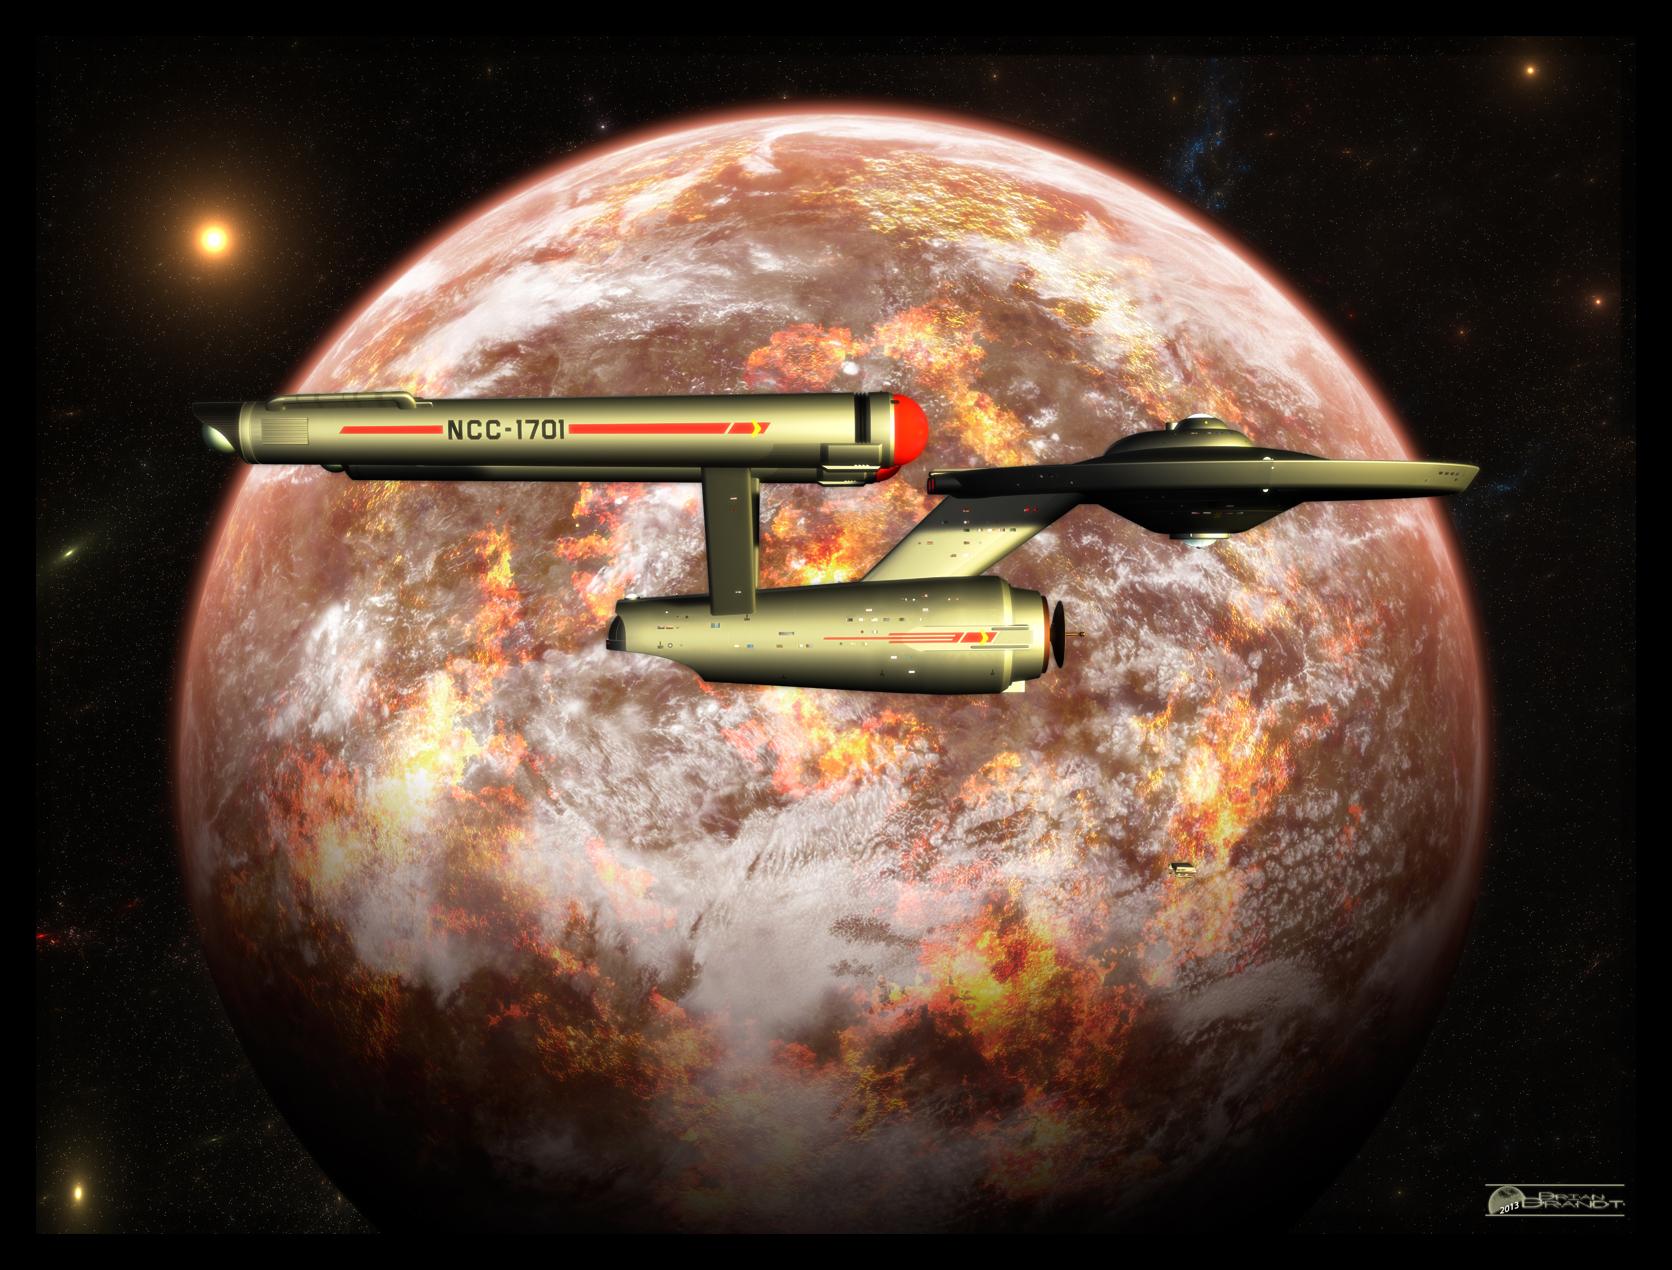 TOS Enterprise in orbit by MotoTsume